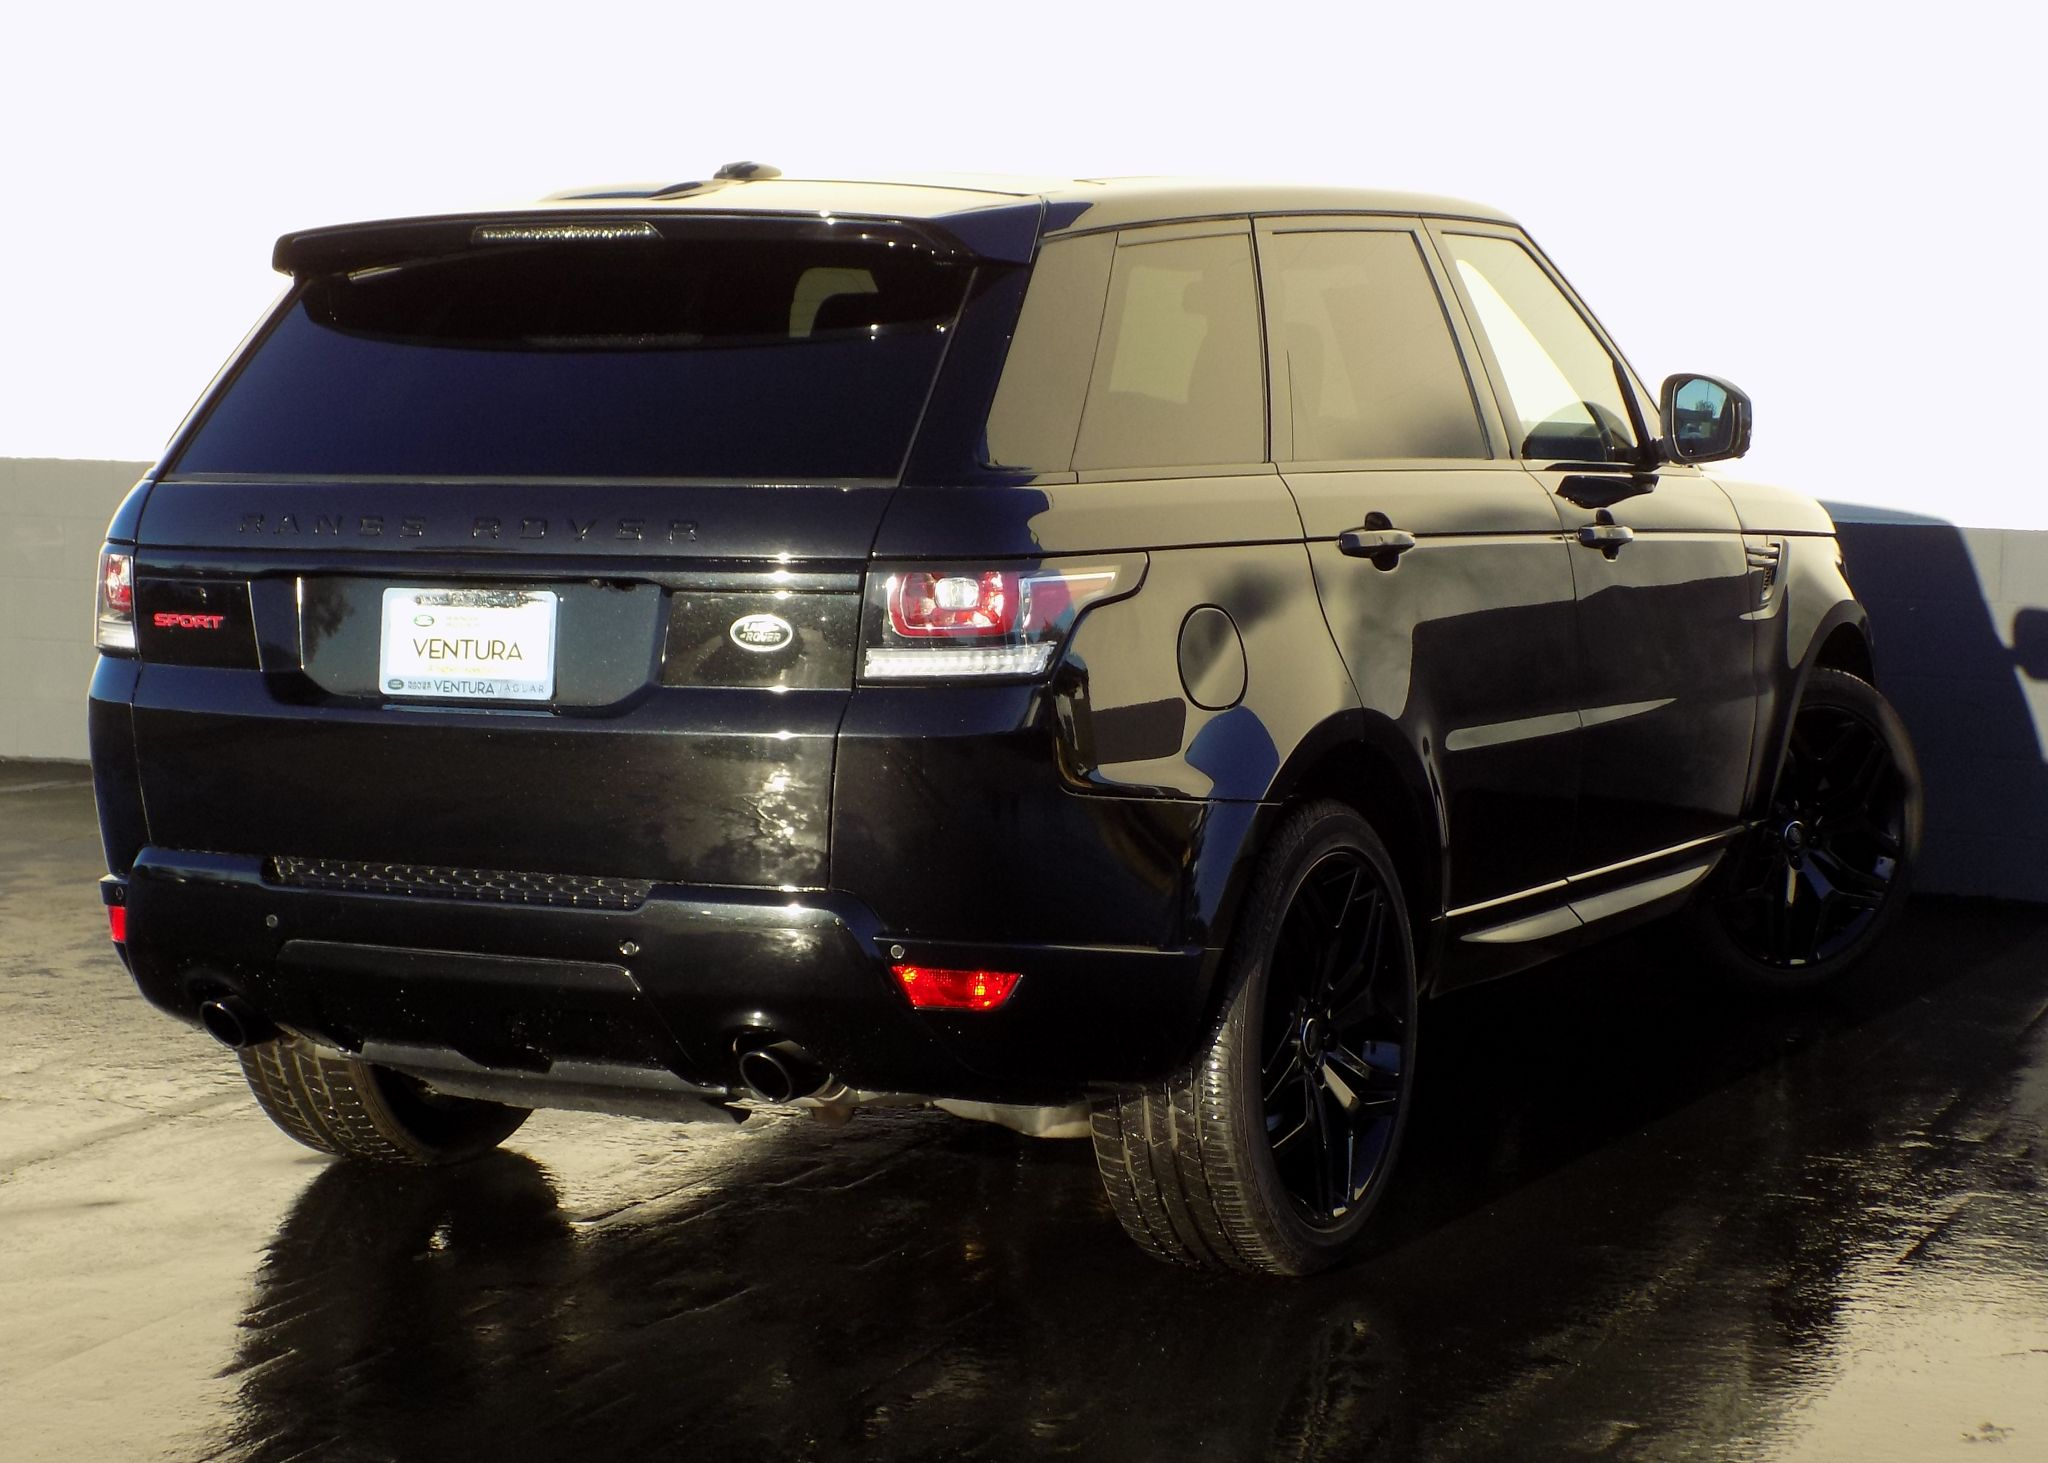 2014 Land Rover Range Rover Sport in Ventura Used Land Rover Range